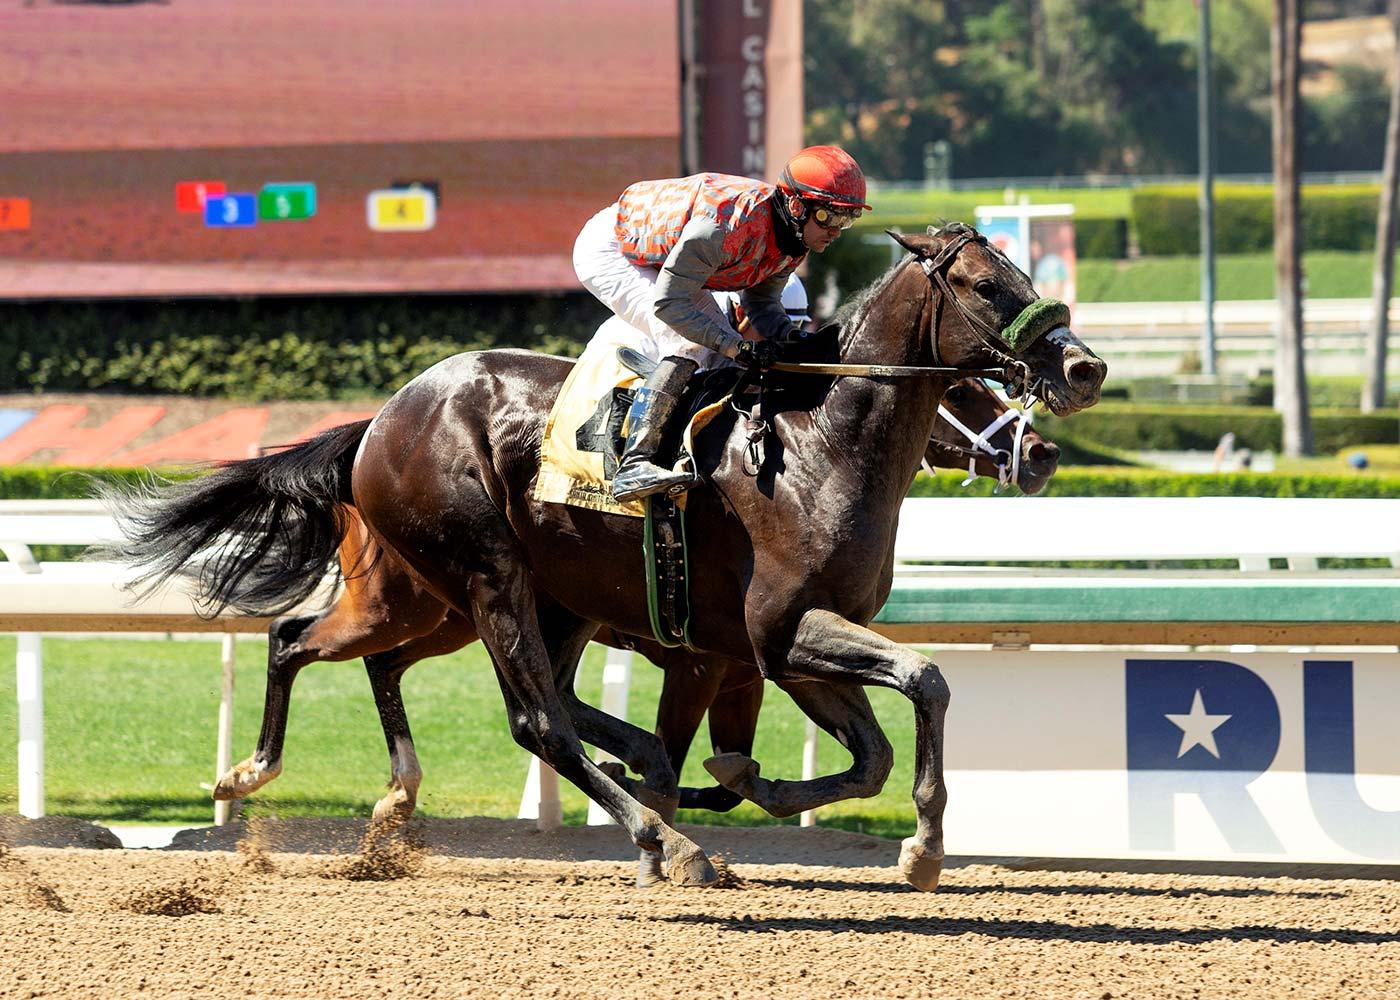 Finneus racehorse wins race